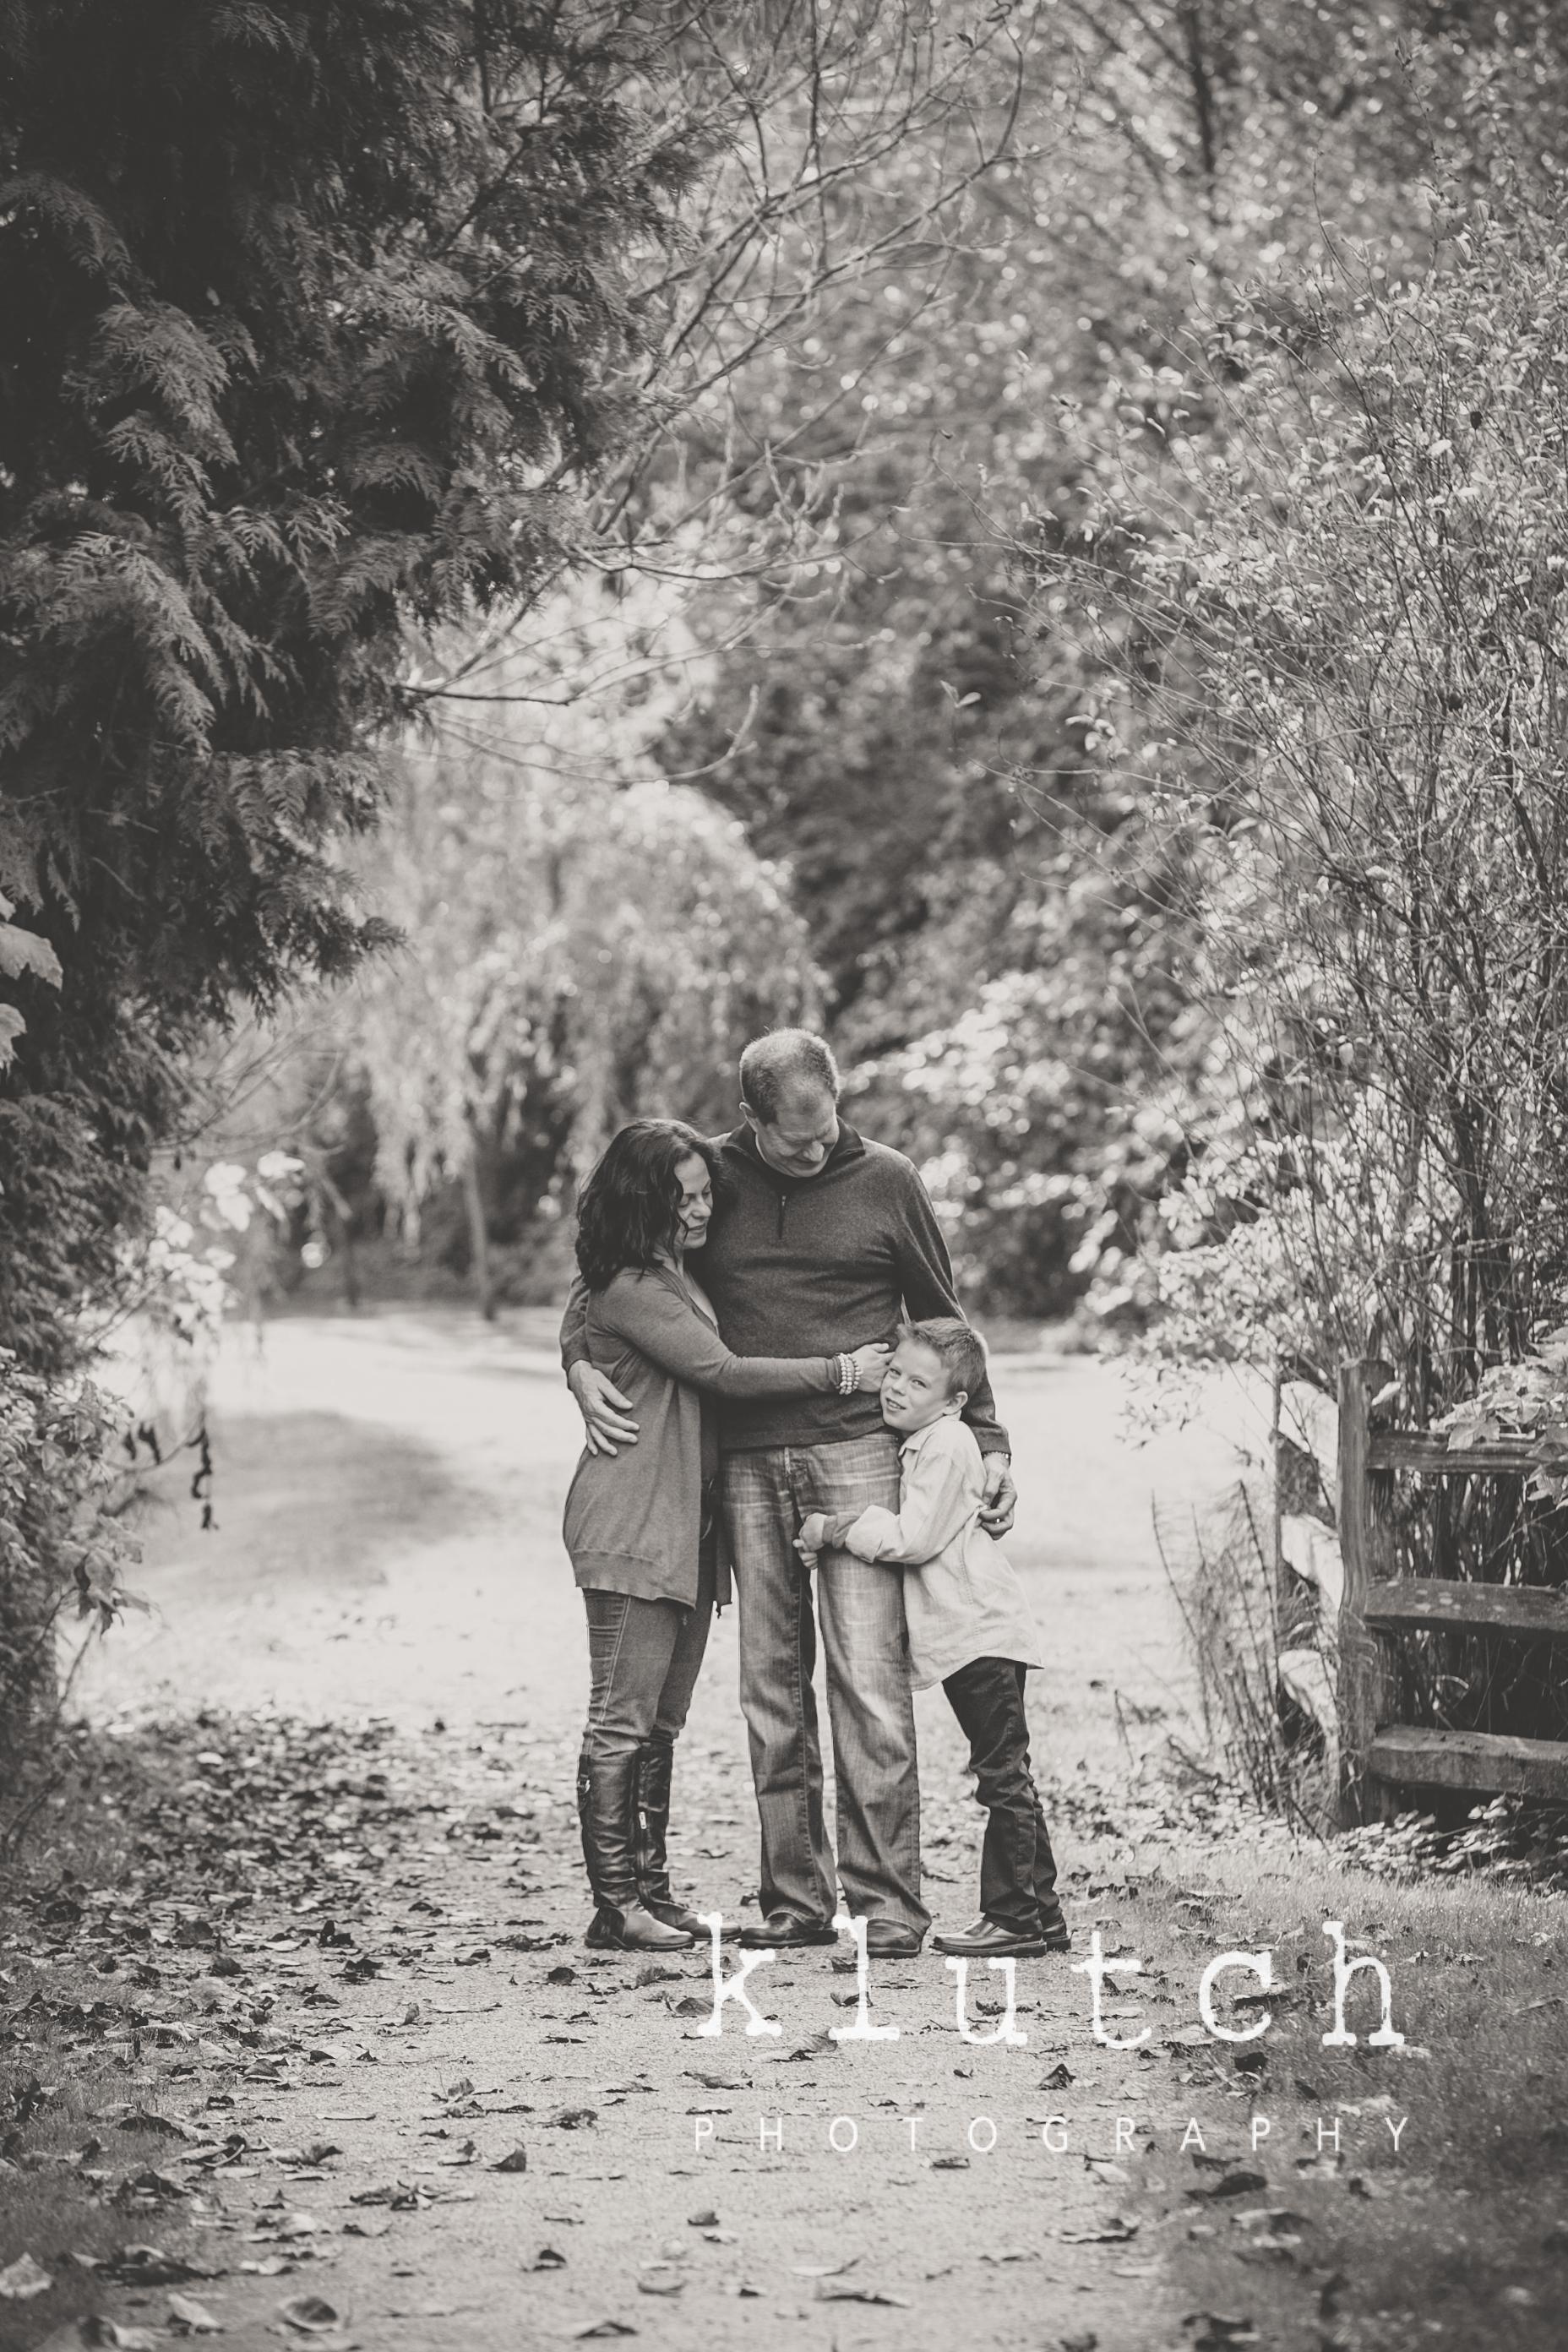 Klutch Photography,white rock family photographer, vancouver family photographer, whiterock lifestyle photographer, life unscripted photographer, life unscripted session, photography,Dina Ferreira Stoddard-47.jpg